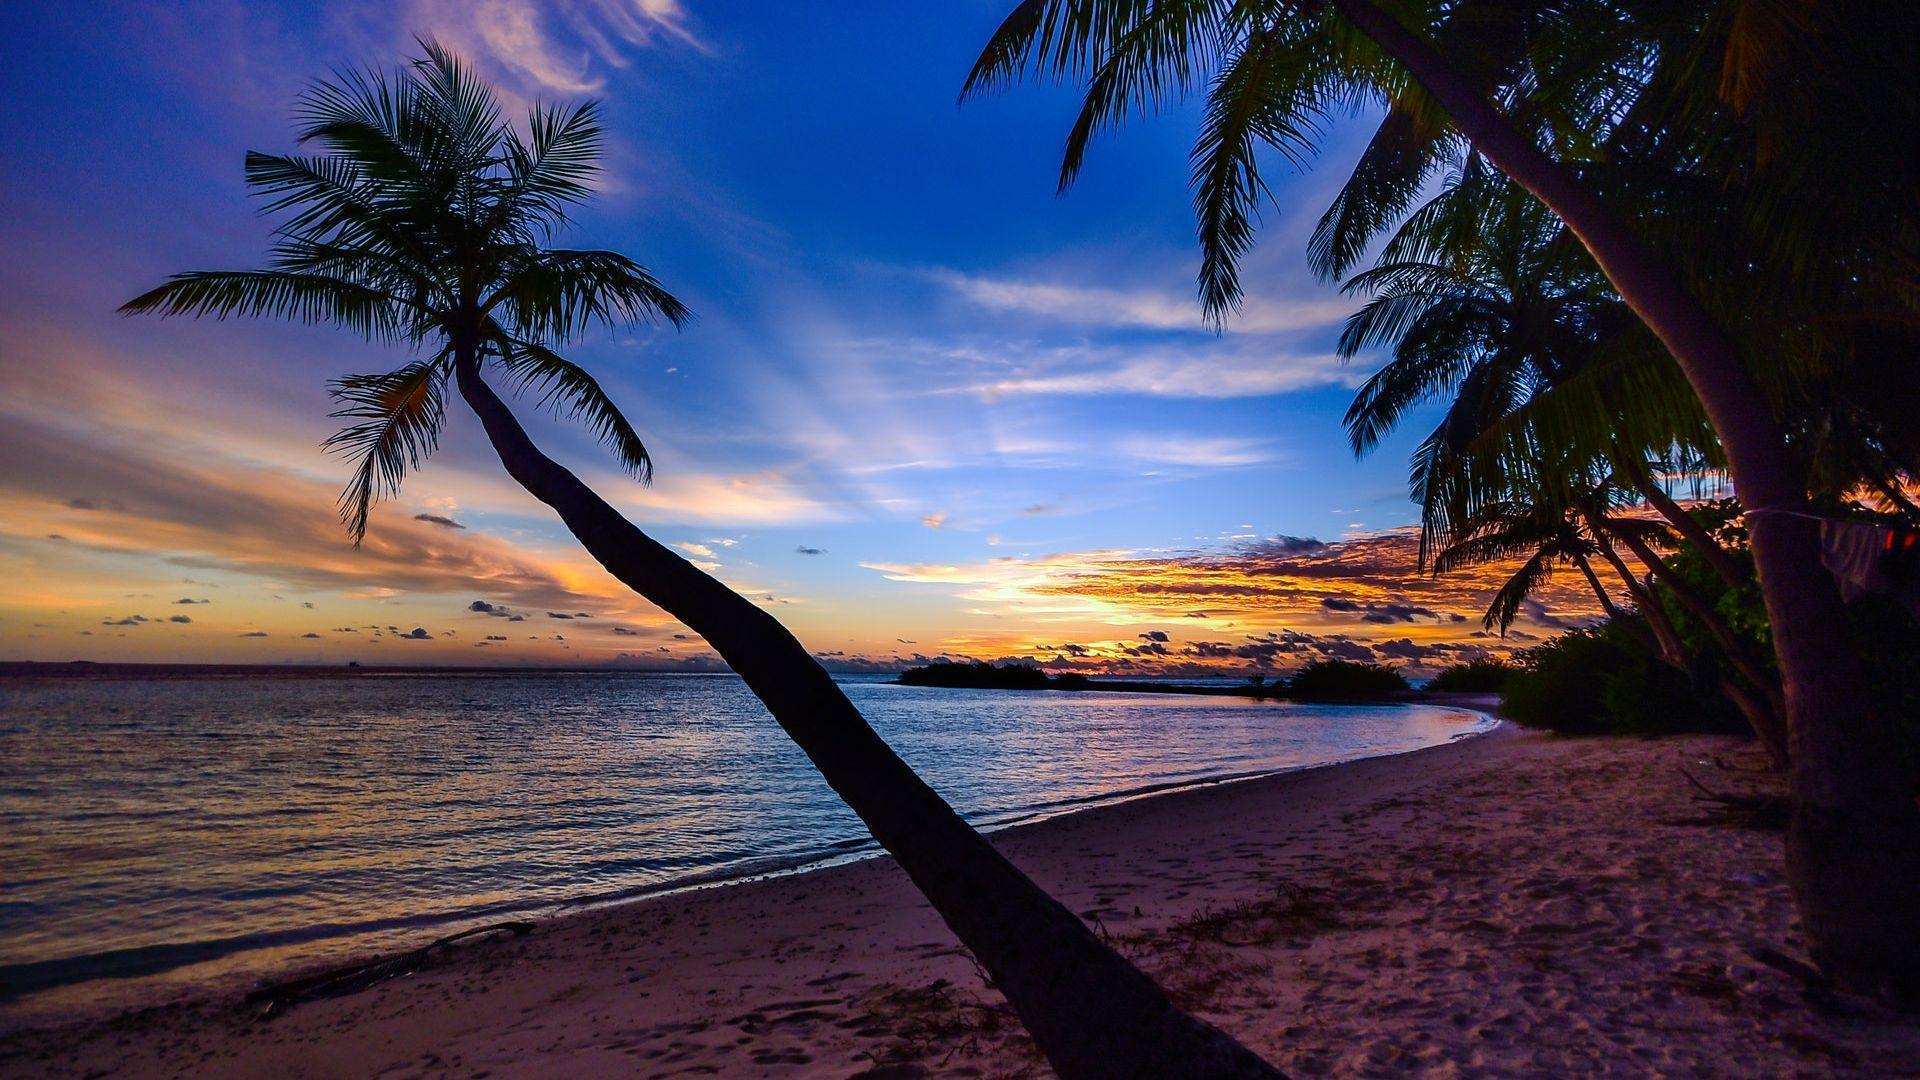 Beach Sunset Desktop Background - Palm Trees Laptop Background , HD Wallpaper & Backgrounds